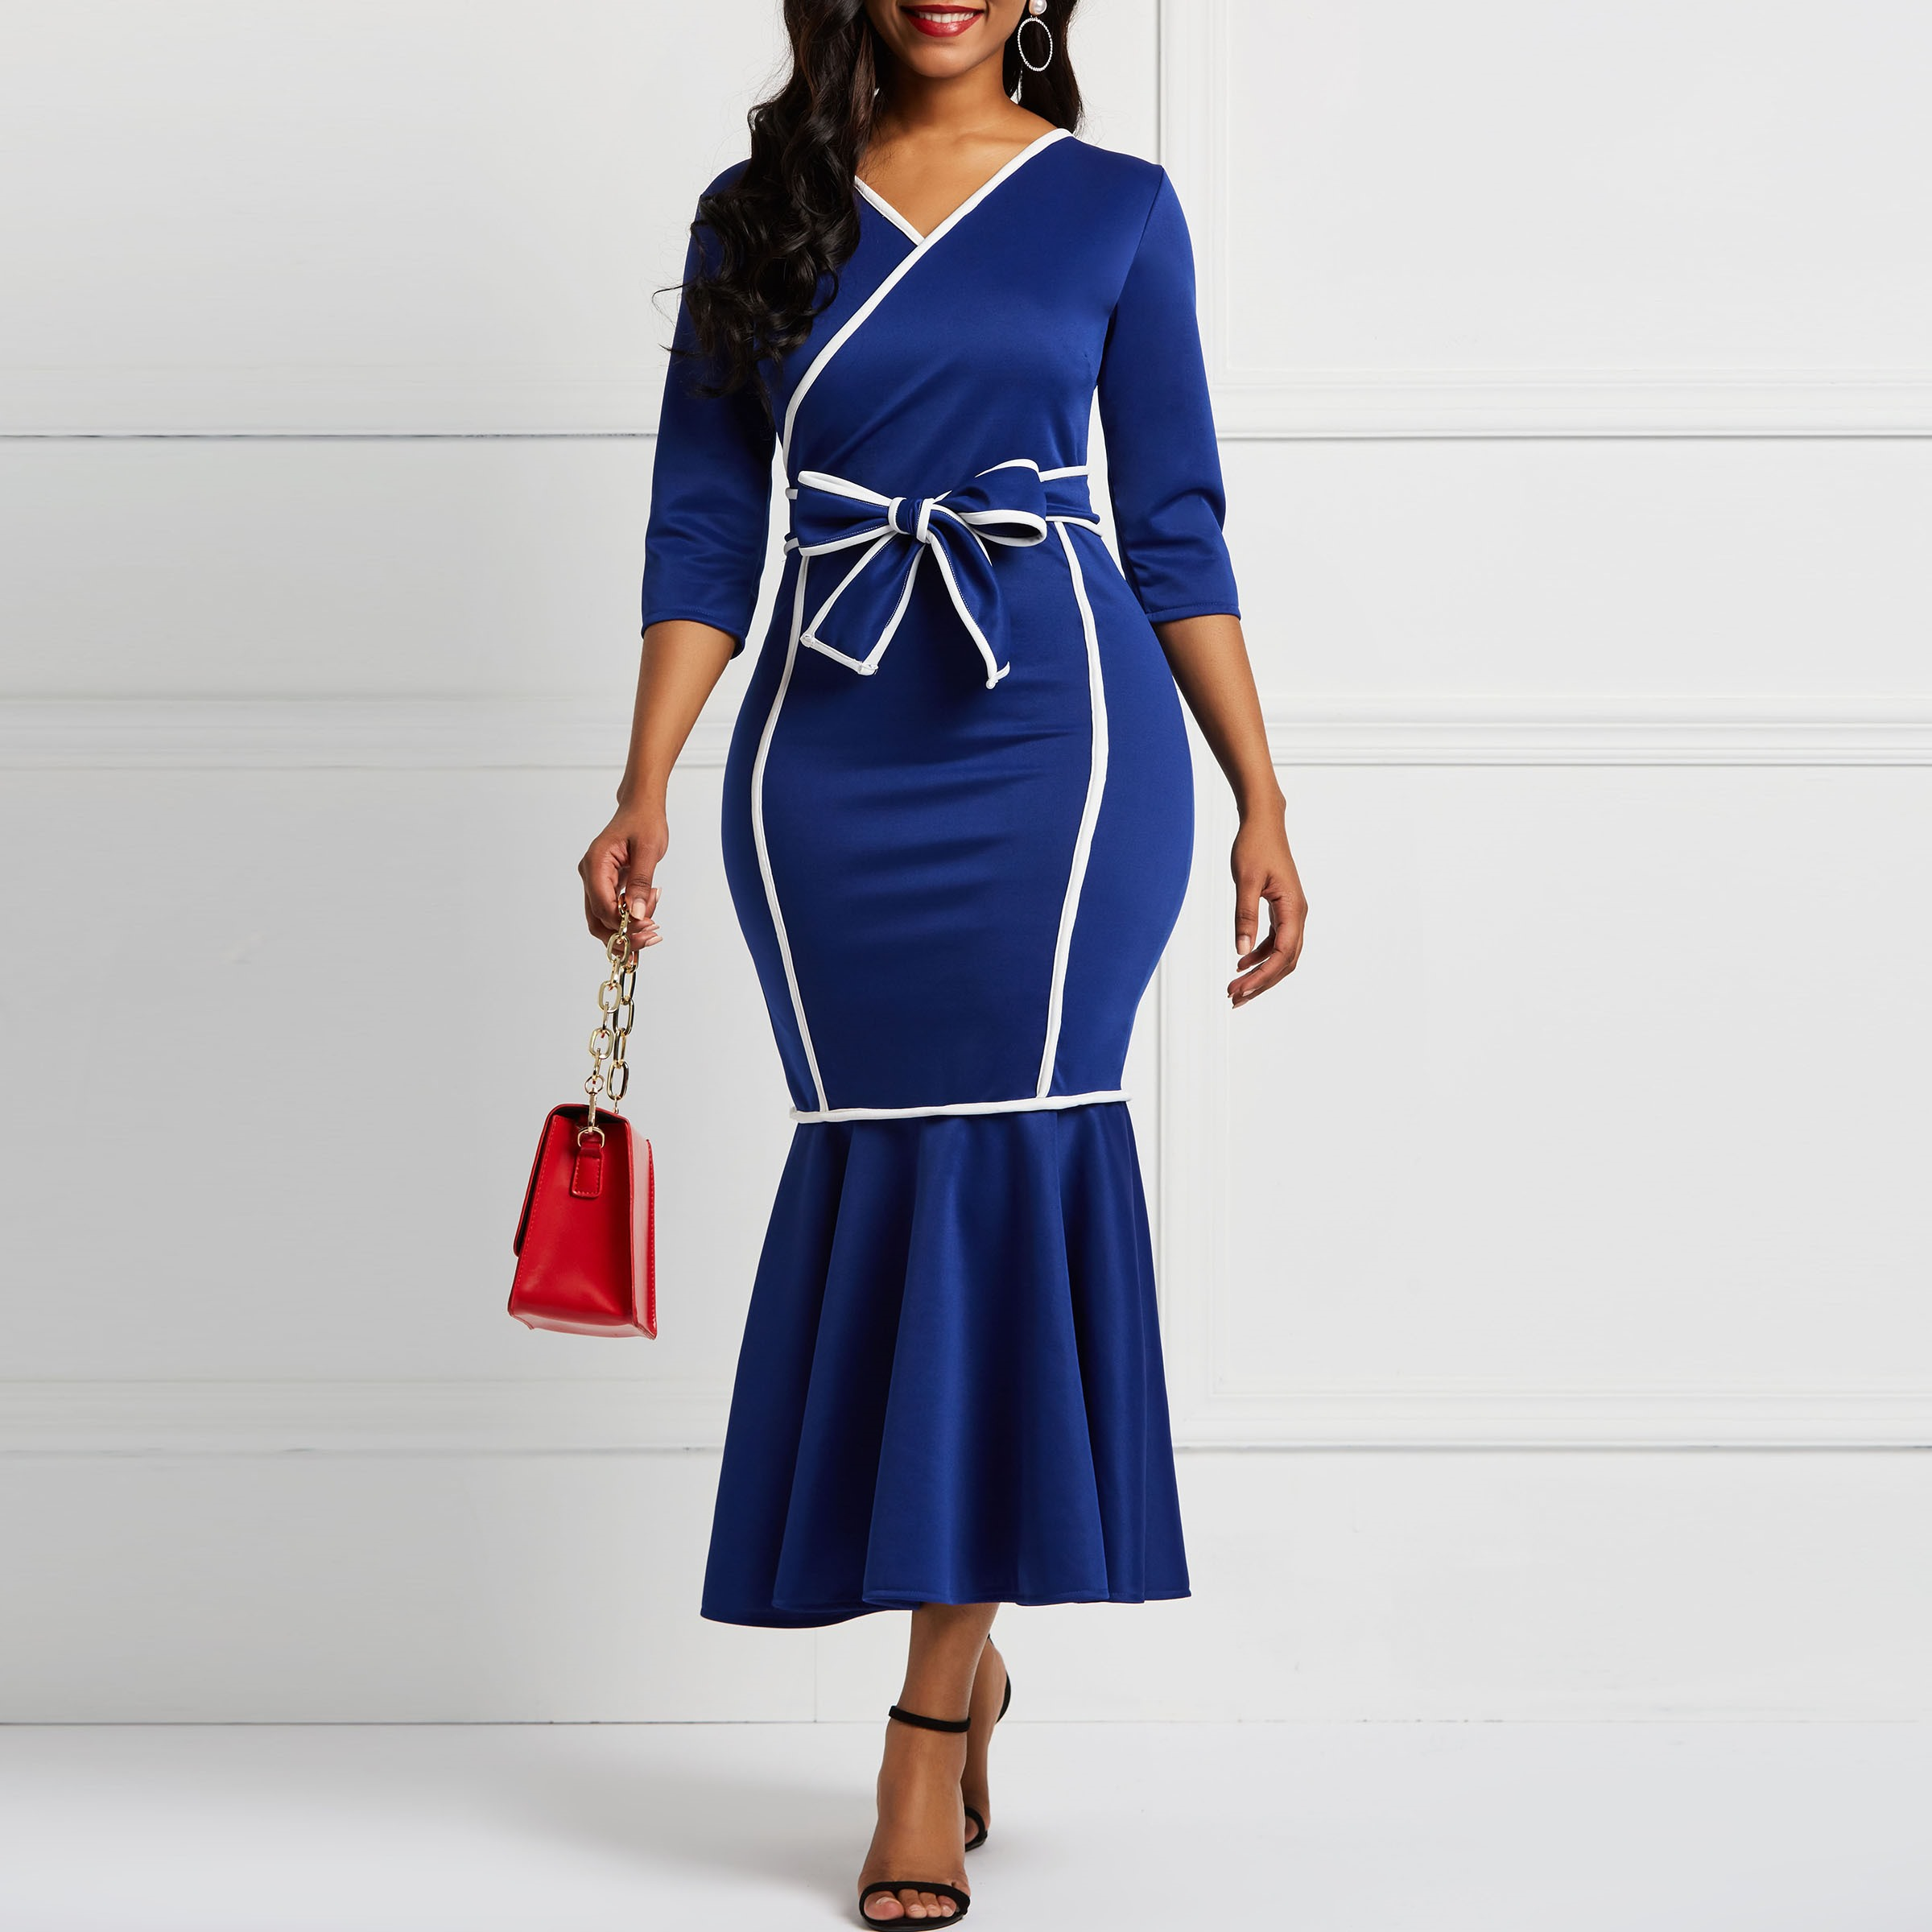 53ee07bc50 Elegant Sexy Women Christmas Dinner Dresses Bodycon Flare Sleeve ...